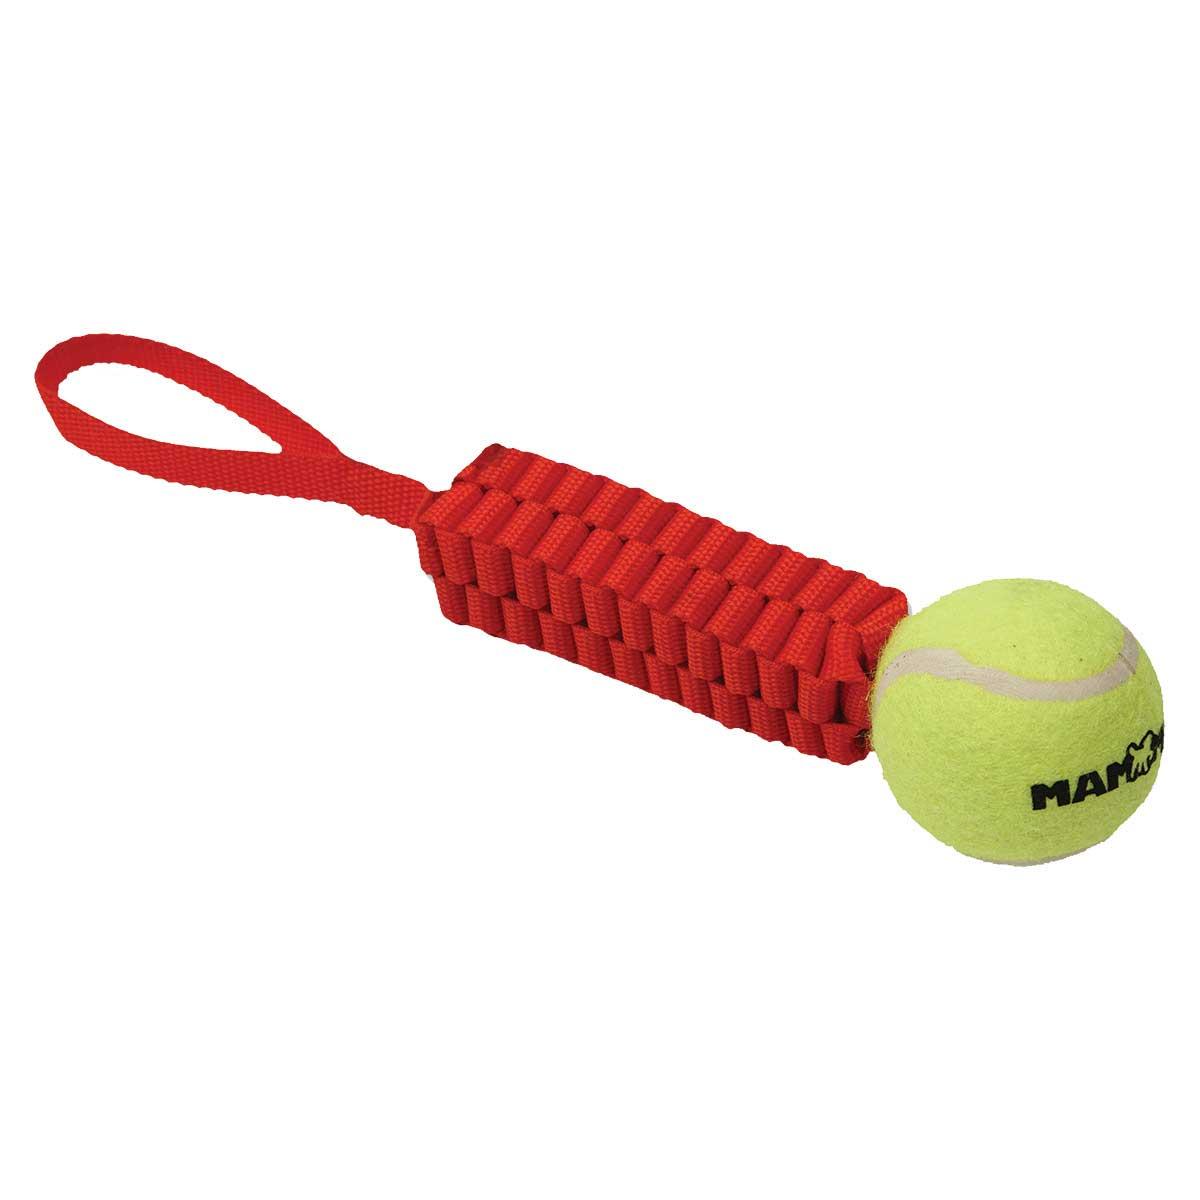 Mammoth Gnarlys with Tennis Ball Fetch Dog Toy - 11 inch